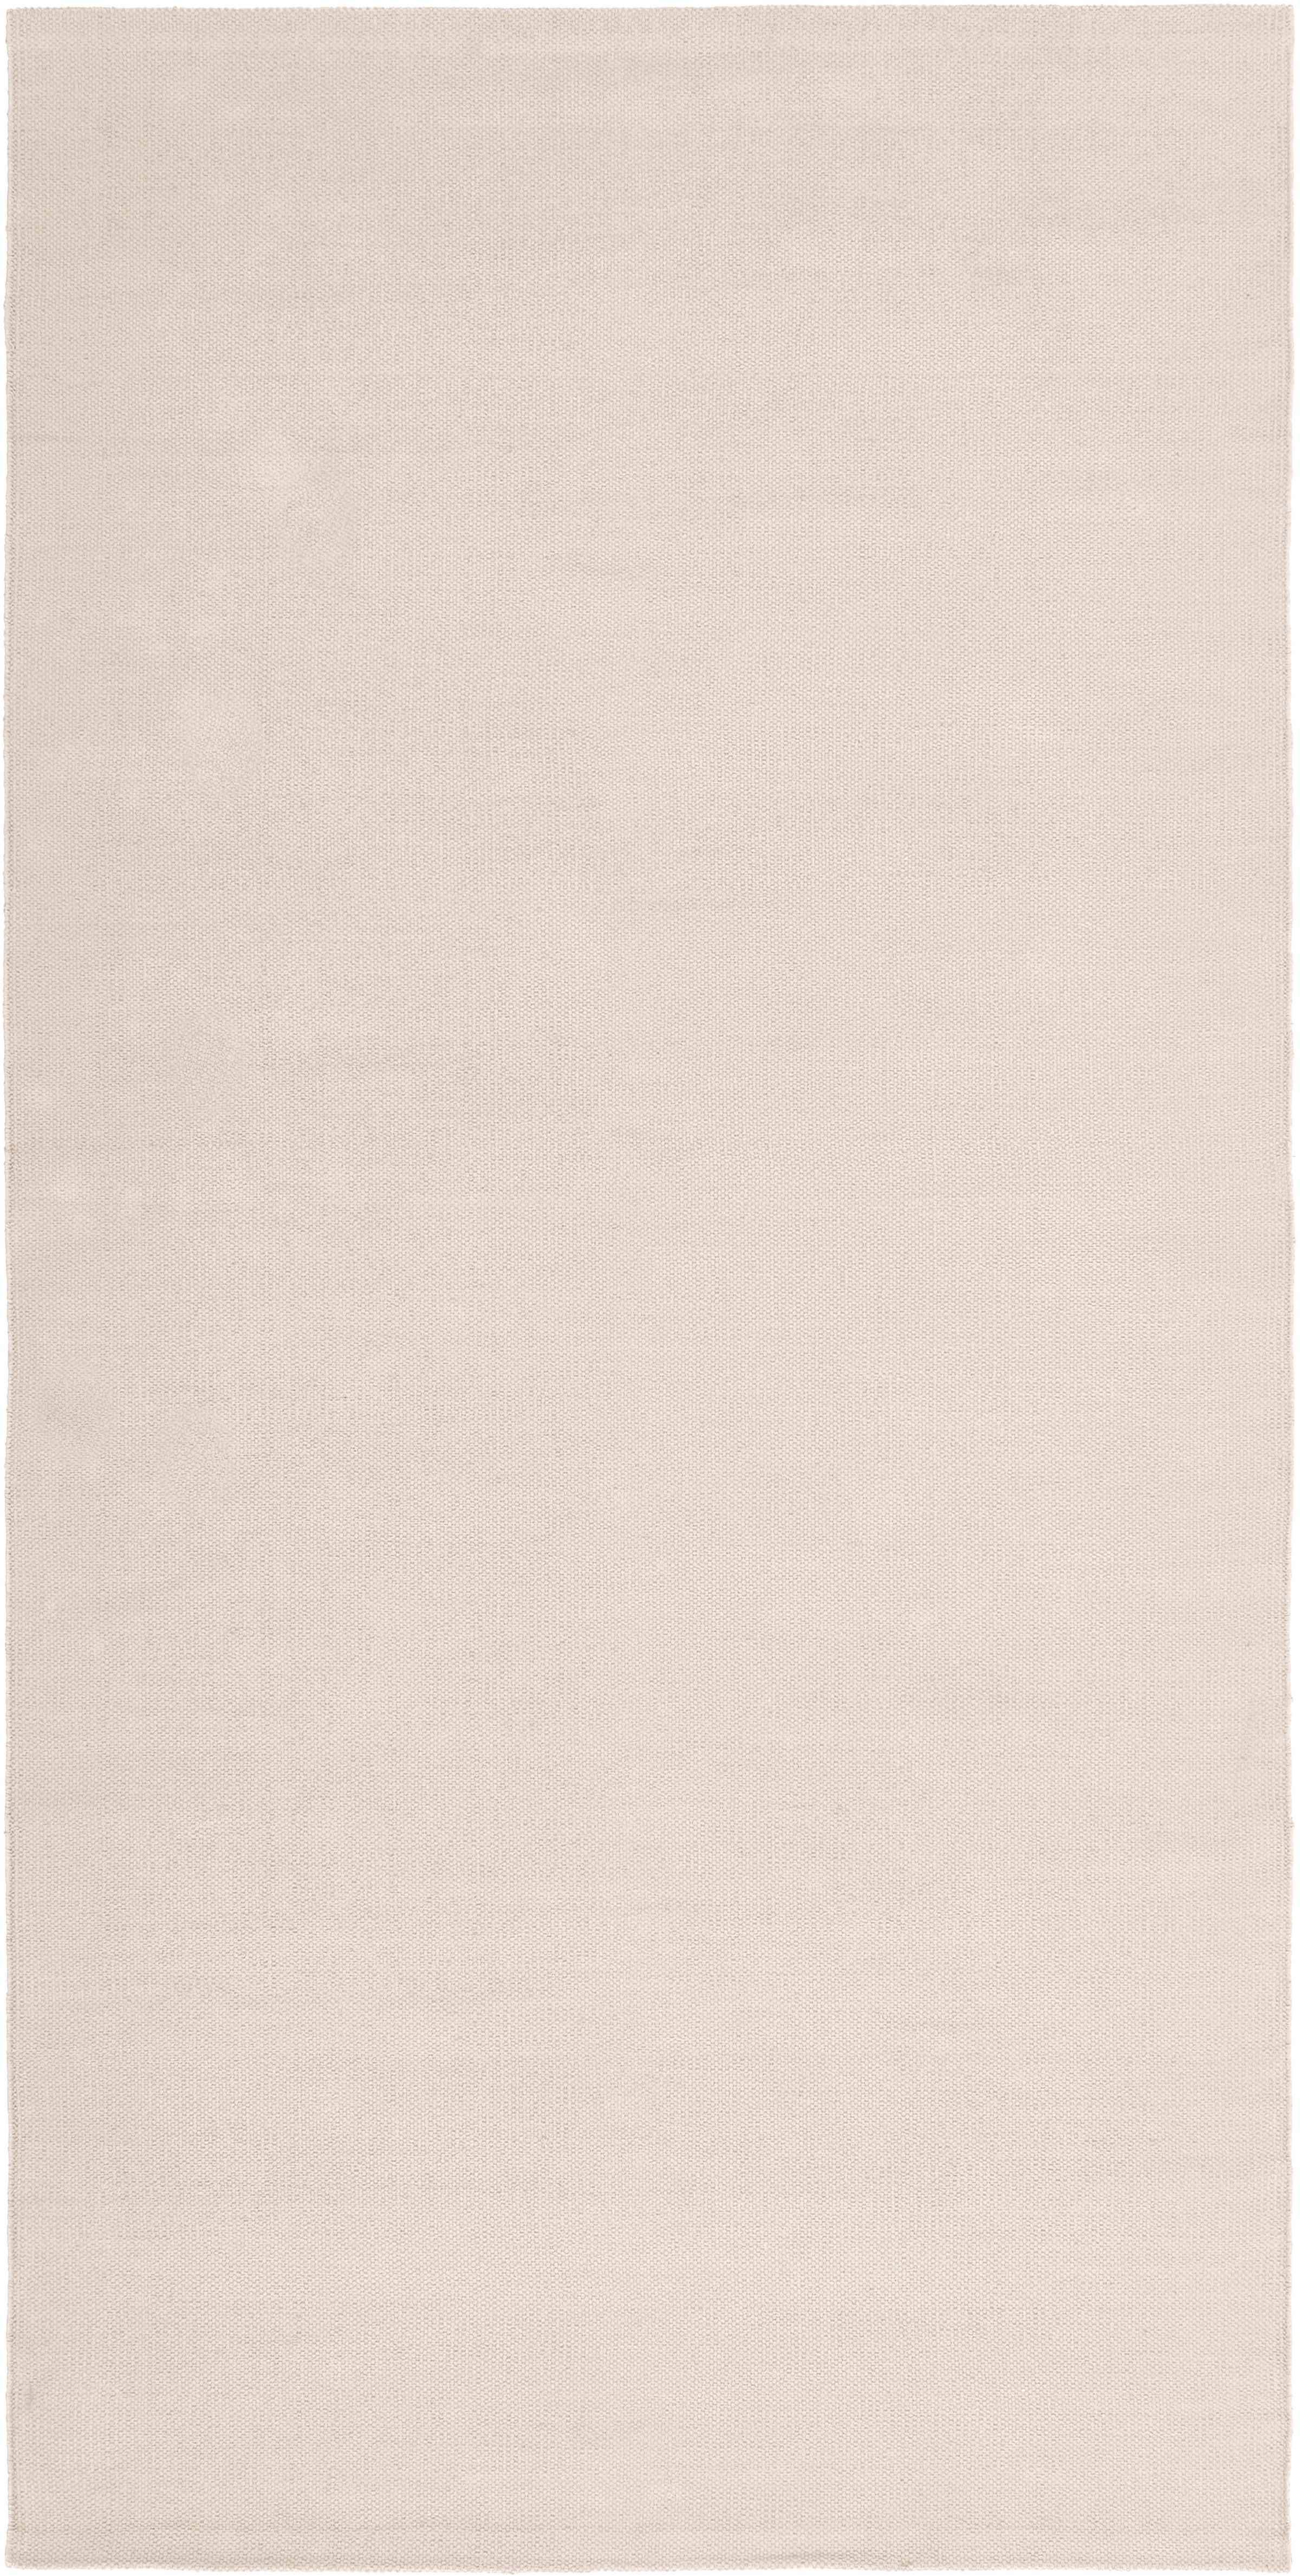 Alfombra artesanal de algodón Agneta, 100%algodón, Gris pardo, An 70 x L 140  cm(Tamaño XS)